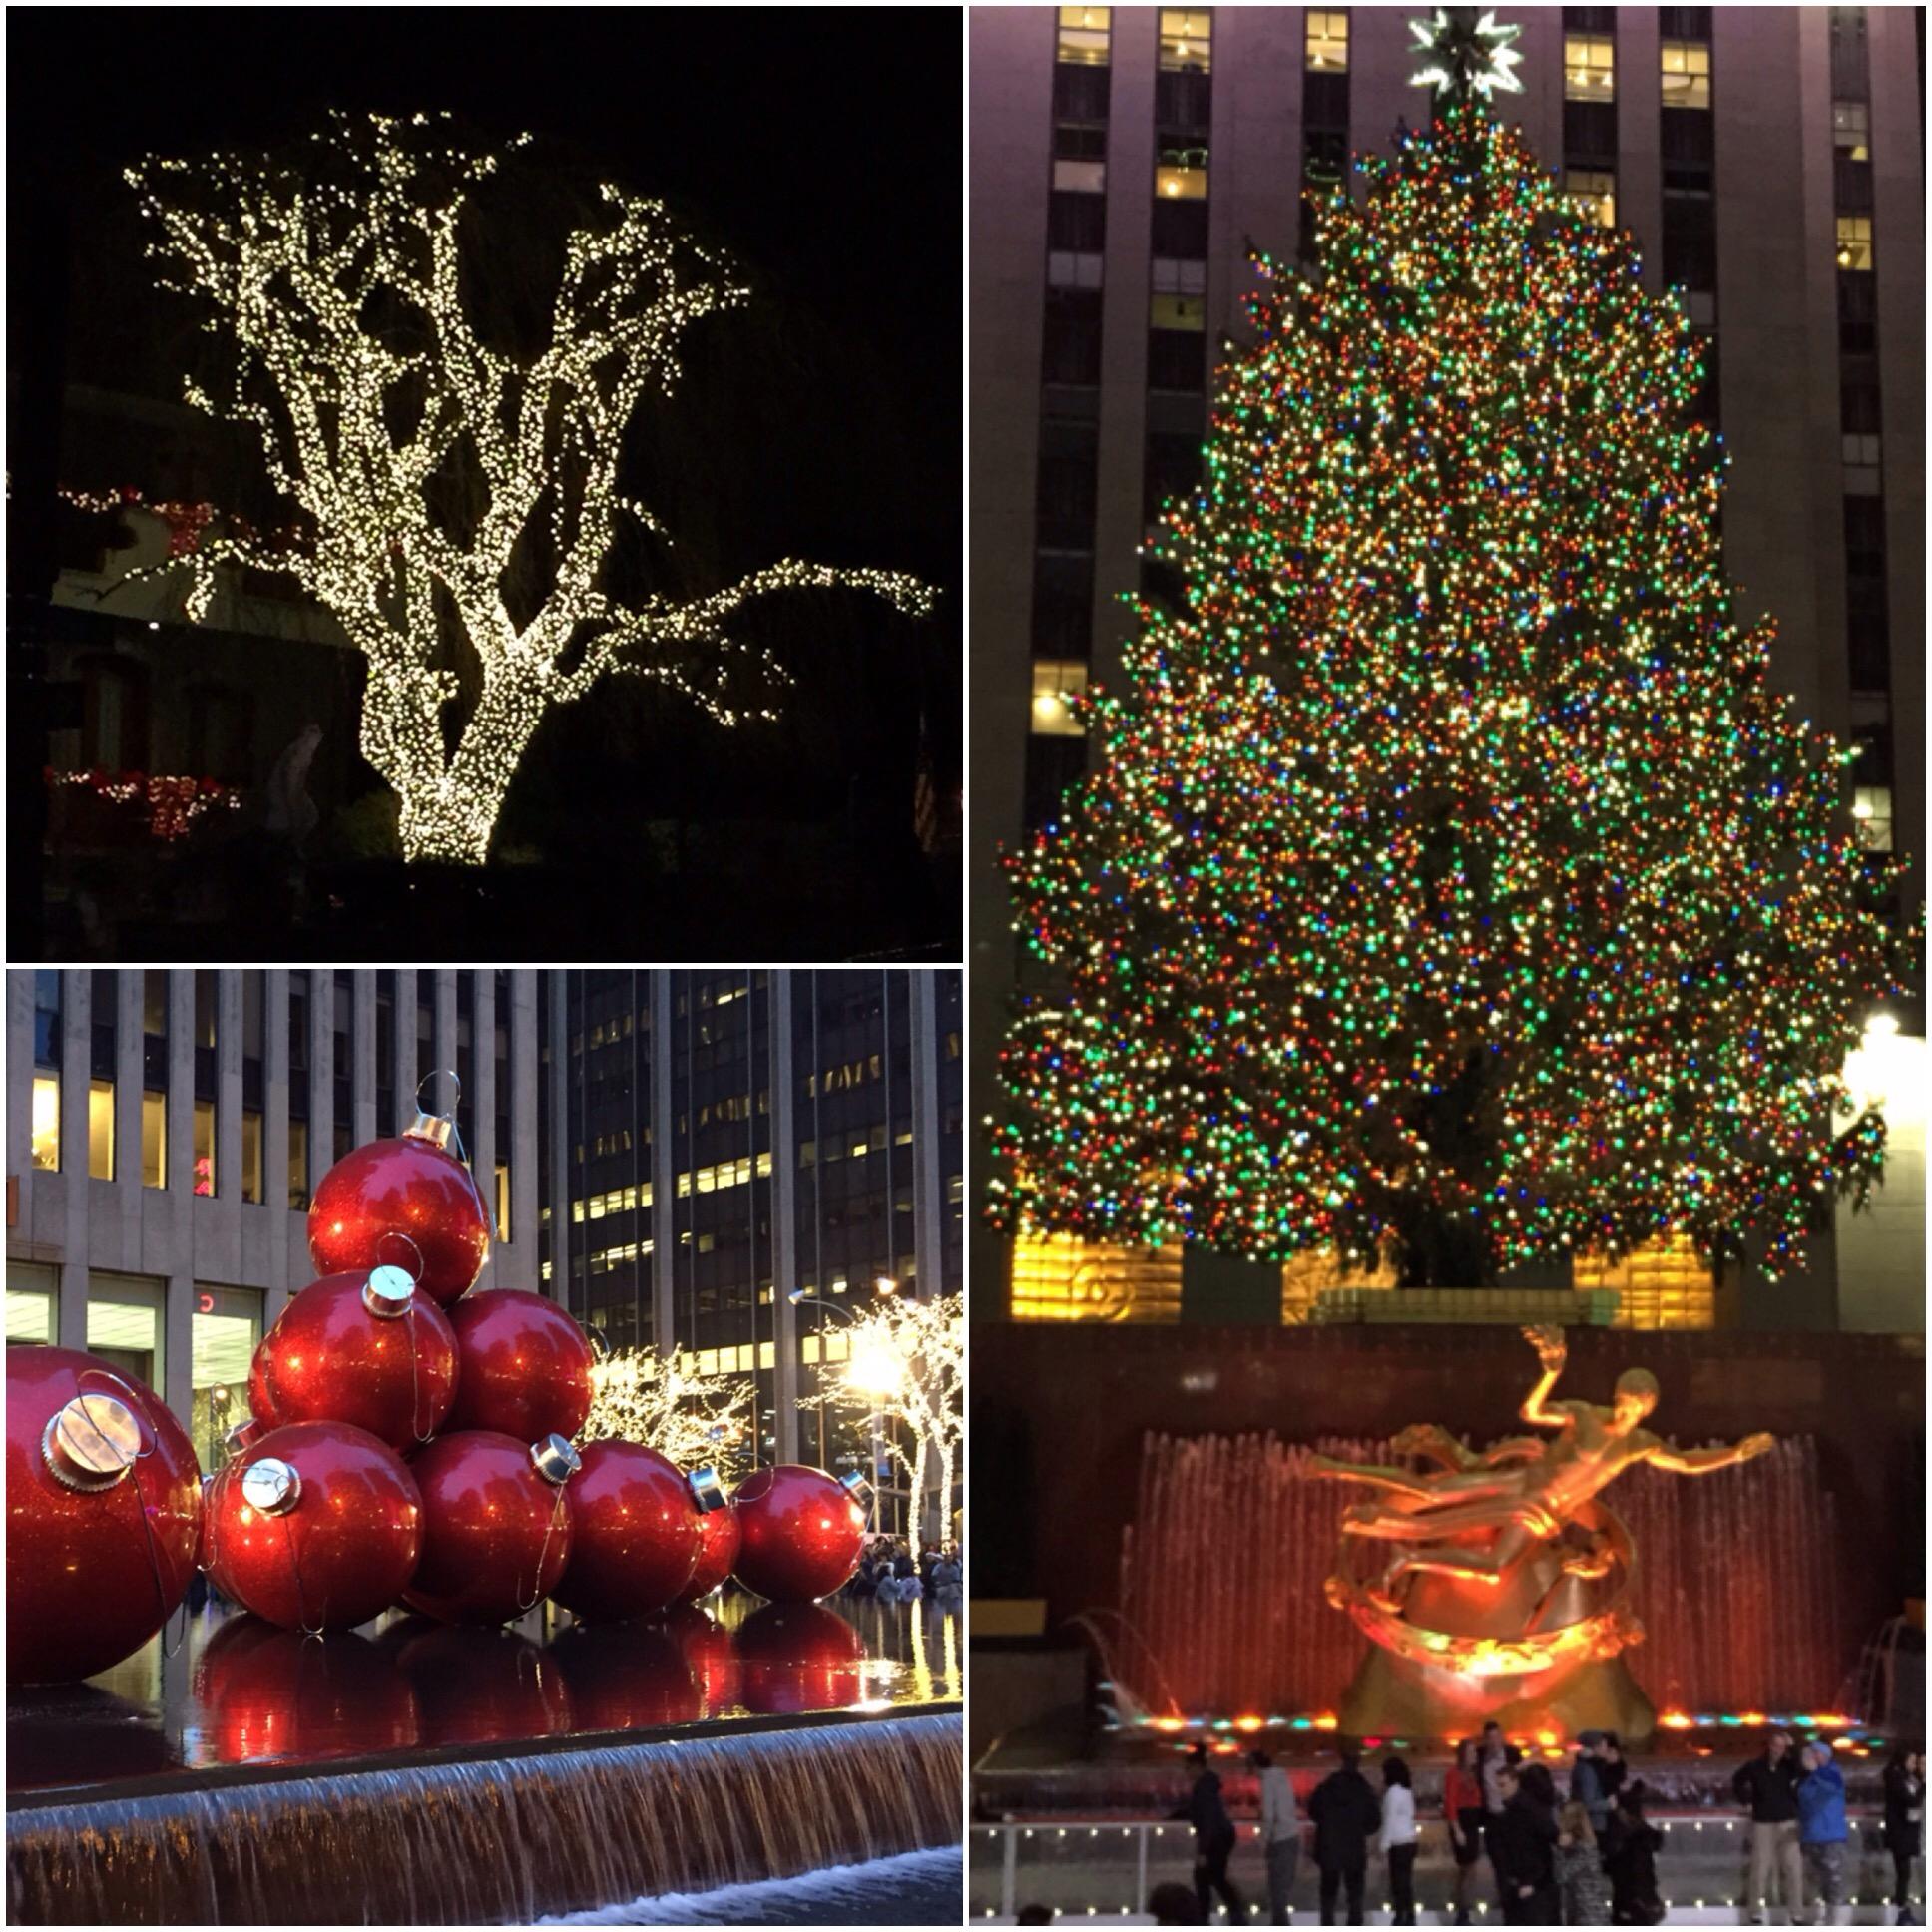 I wish you a merry Christmas – oder – Weihnachtsgrüße | Lilamalerie.de